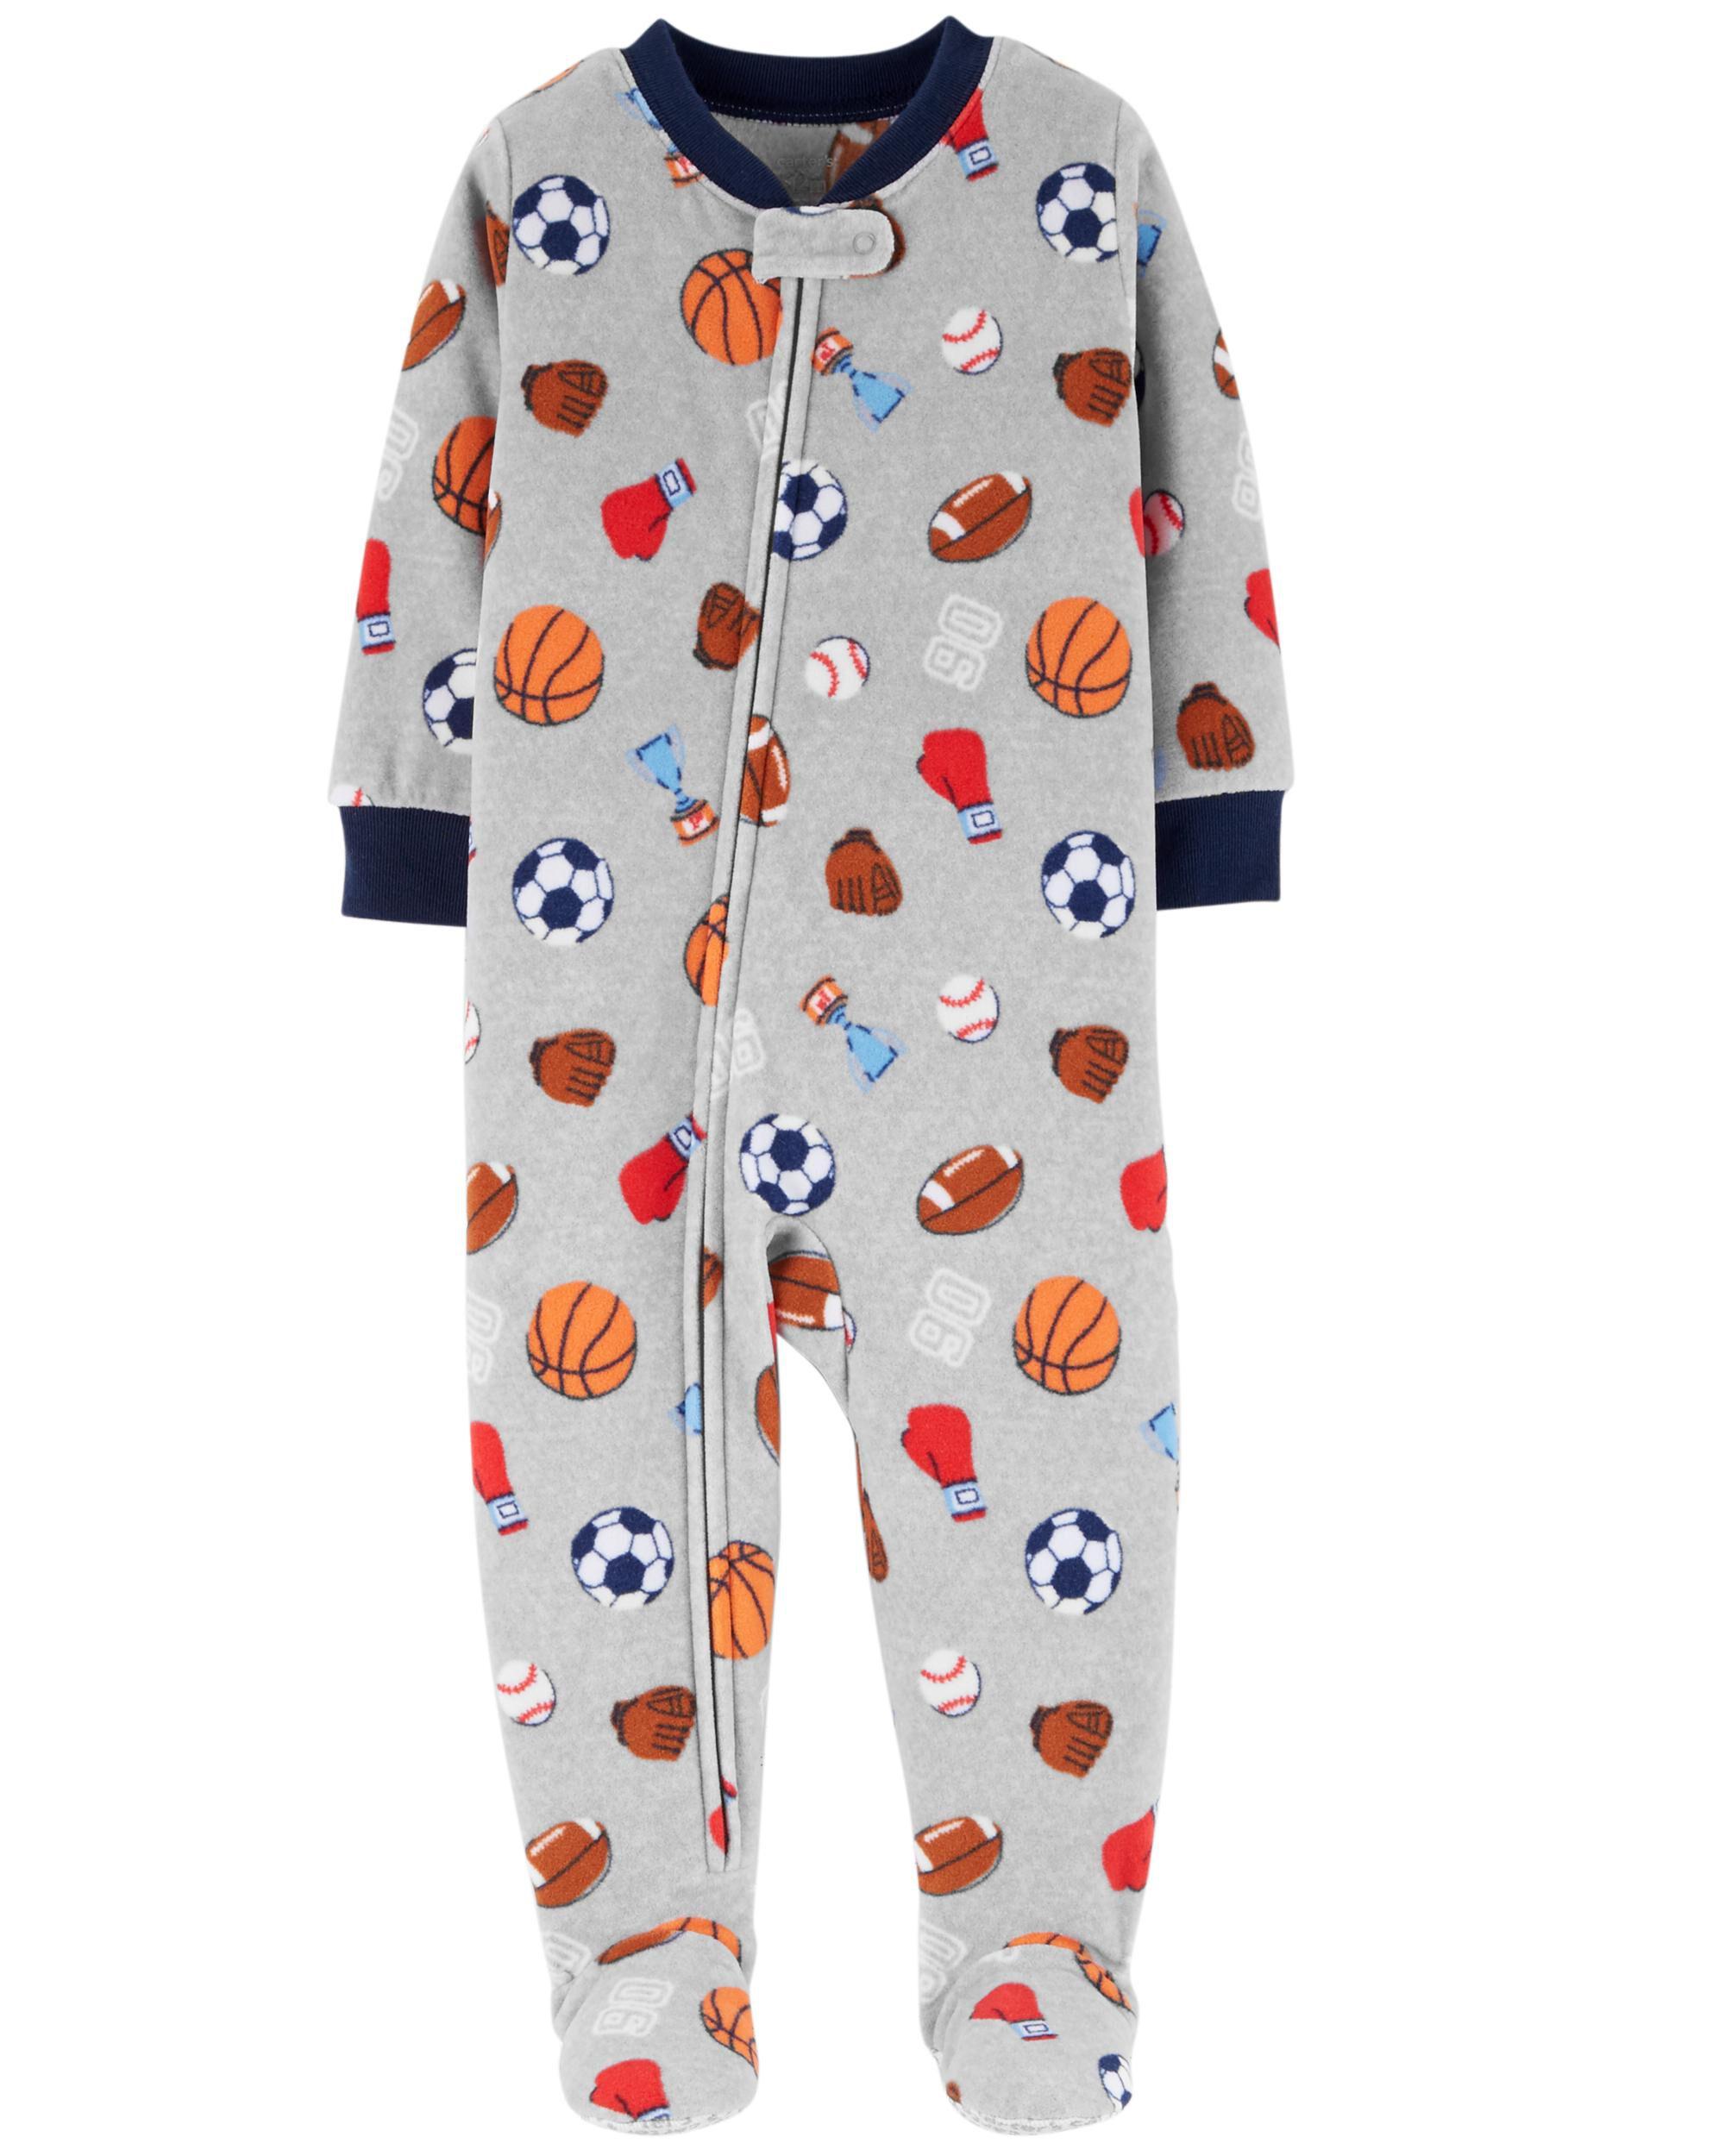 Little Big Boys Pajamas Christmas Car Cotton Gift 2 Piece Children ...